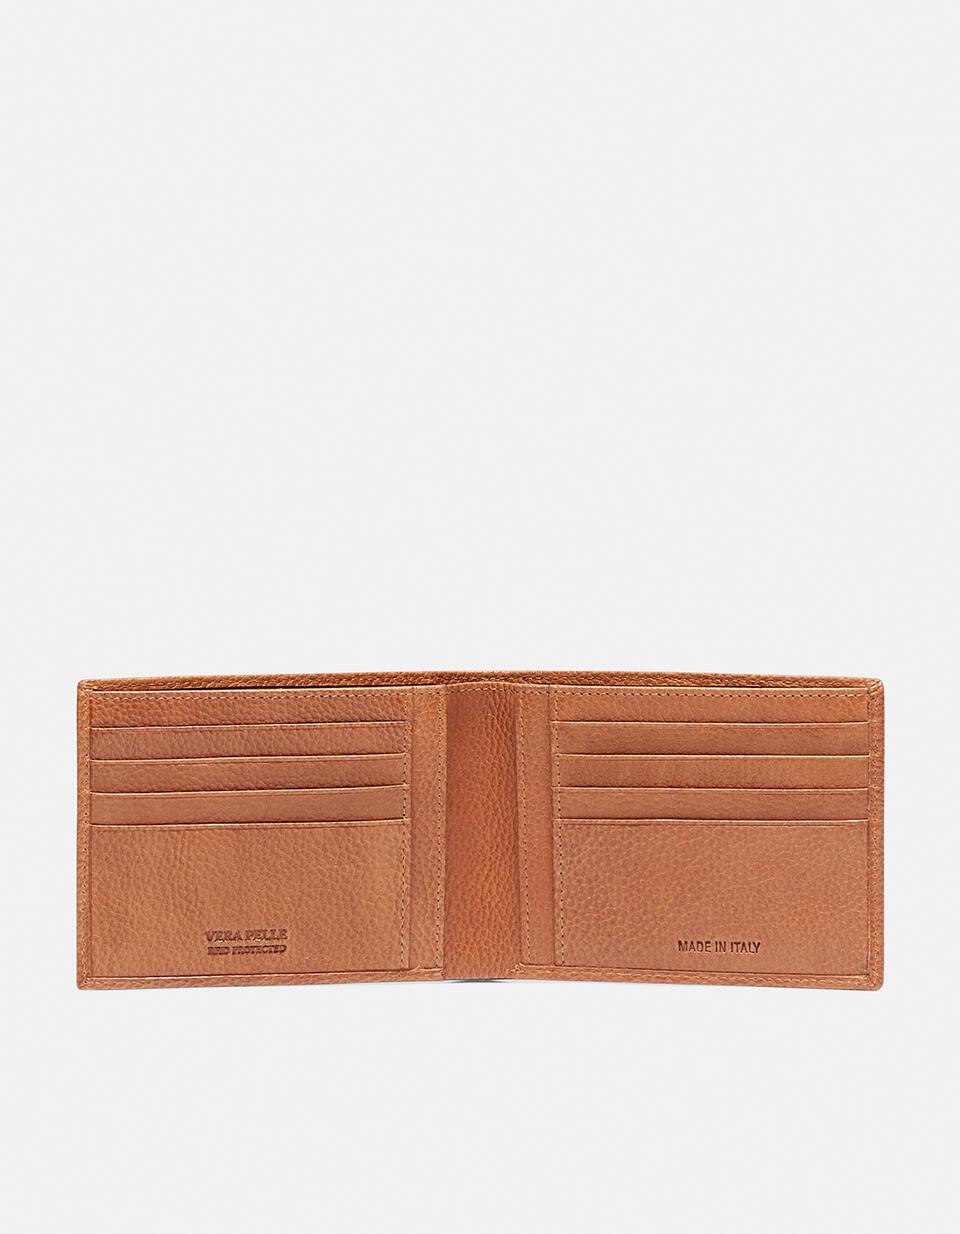 Anti-rfid Calf wallet TAN Cuoieria Fiorentina